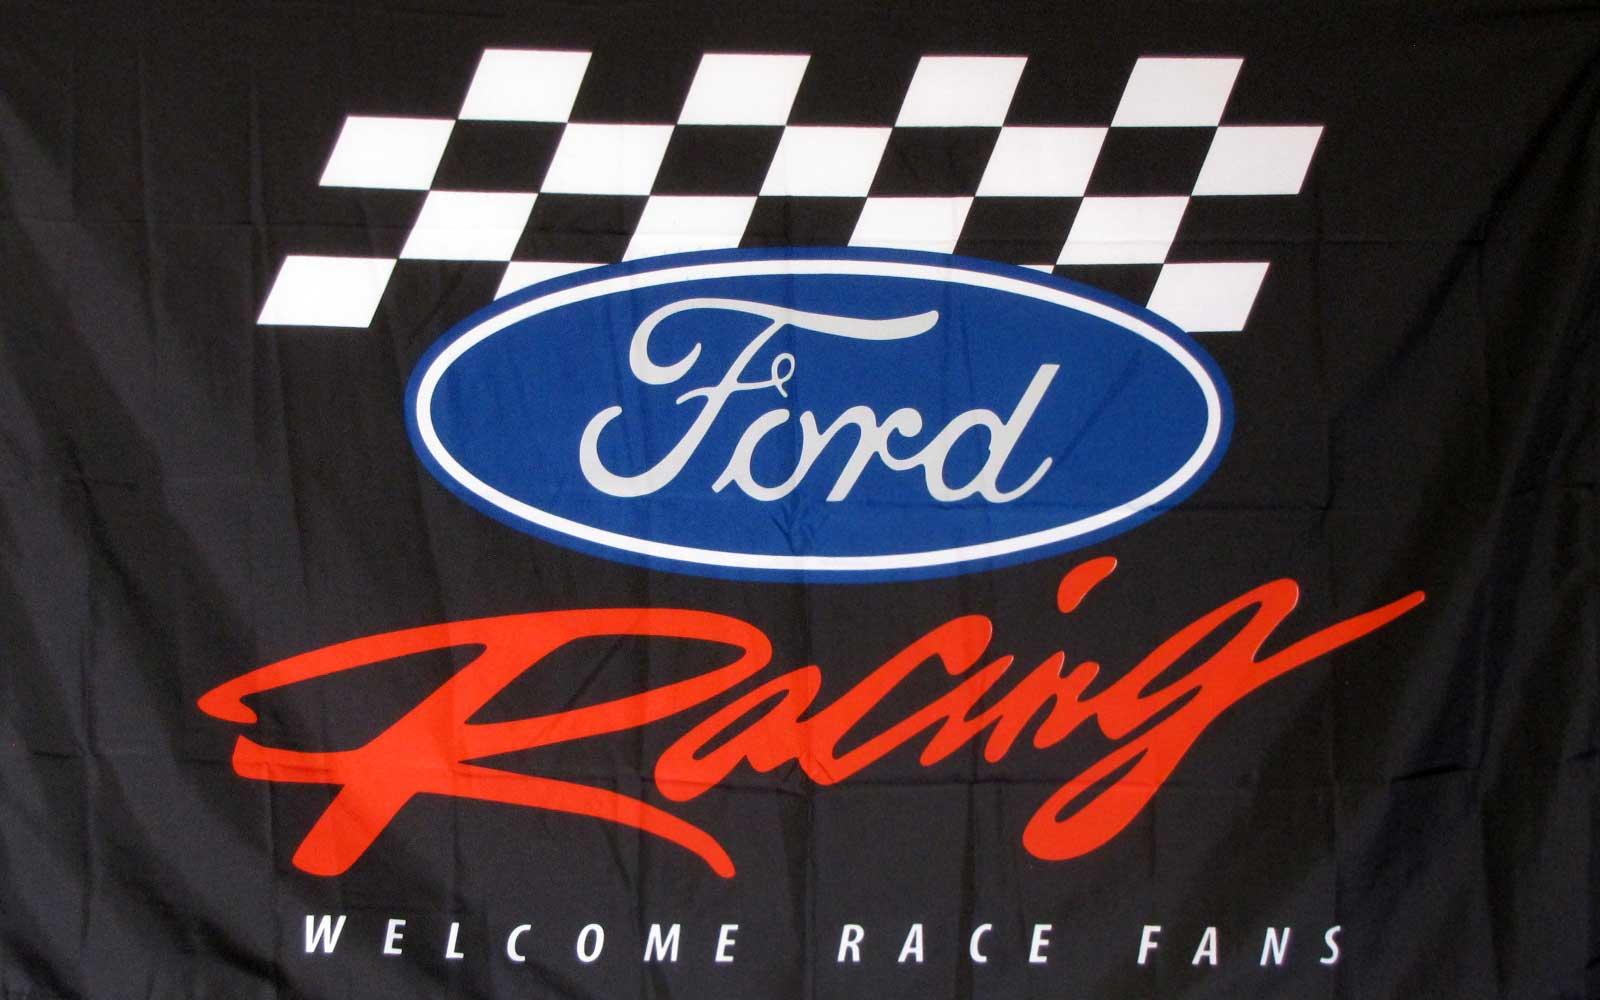 ford racing wallpaper  Ford Racing Wallpaper 02 - [1600x1000]